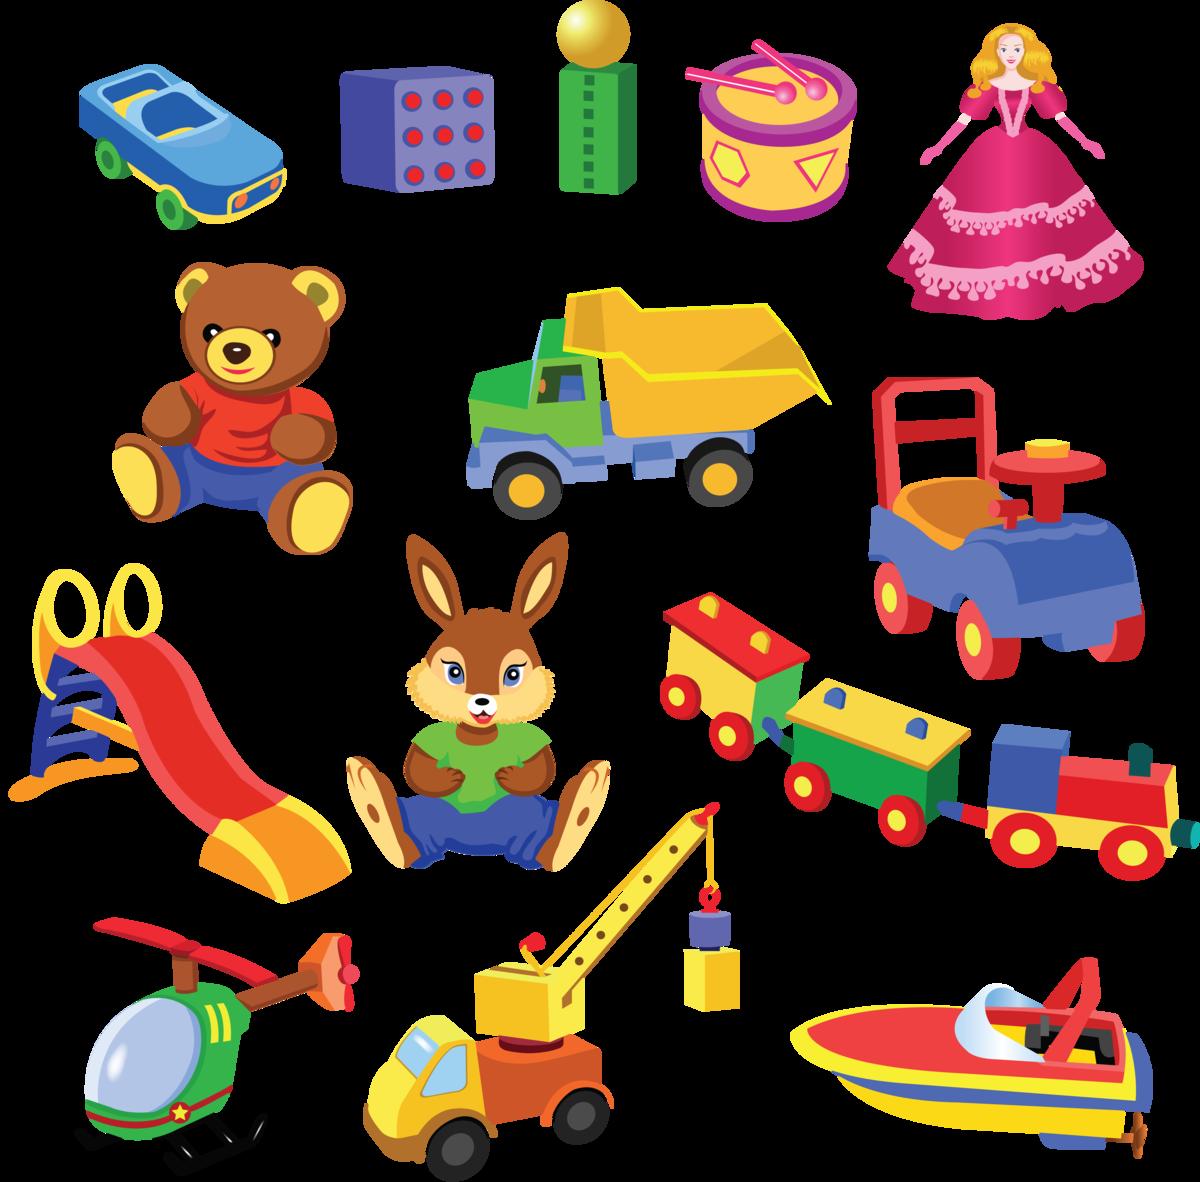 Днем, картинка игрушки для детского сада